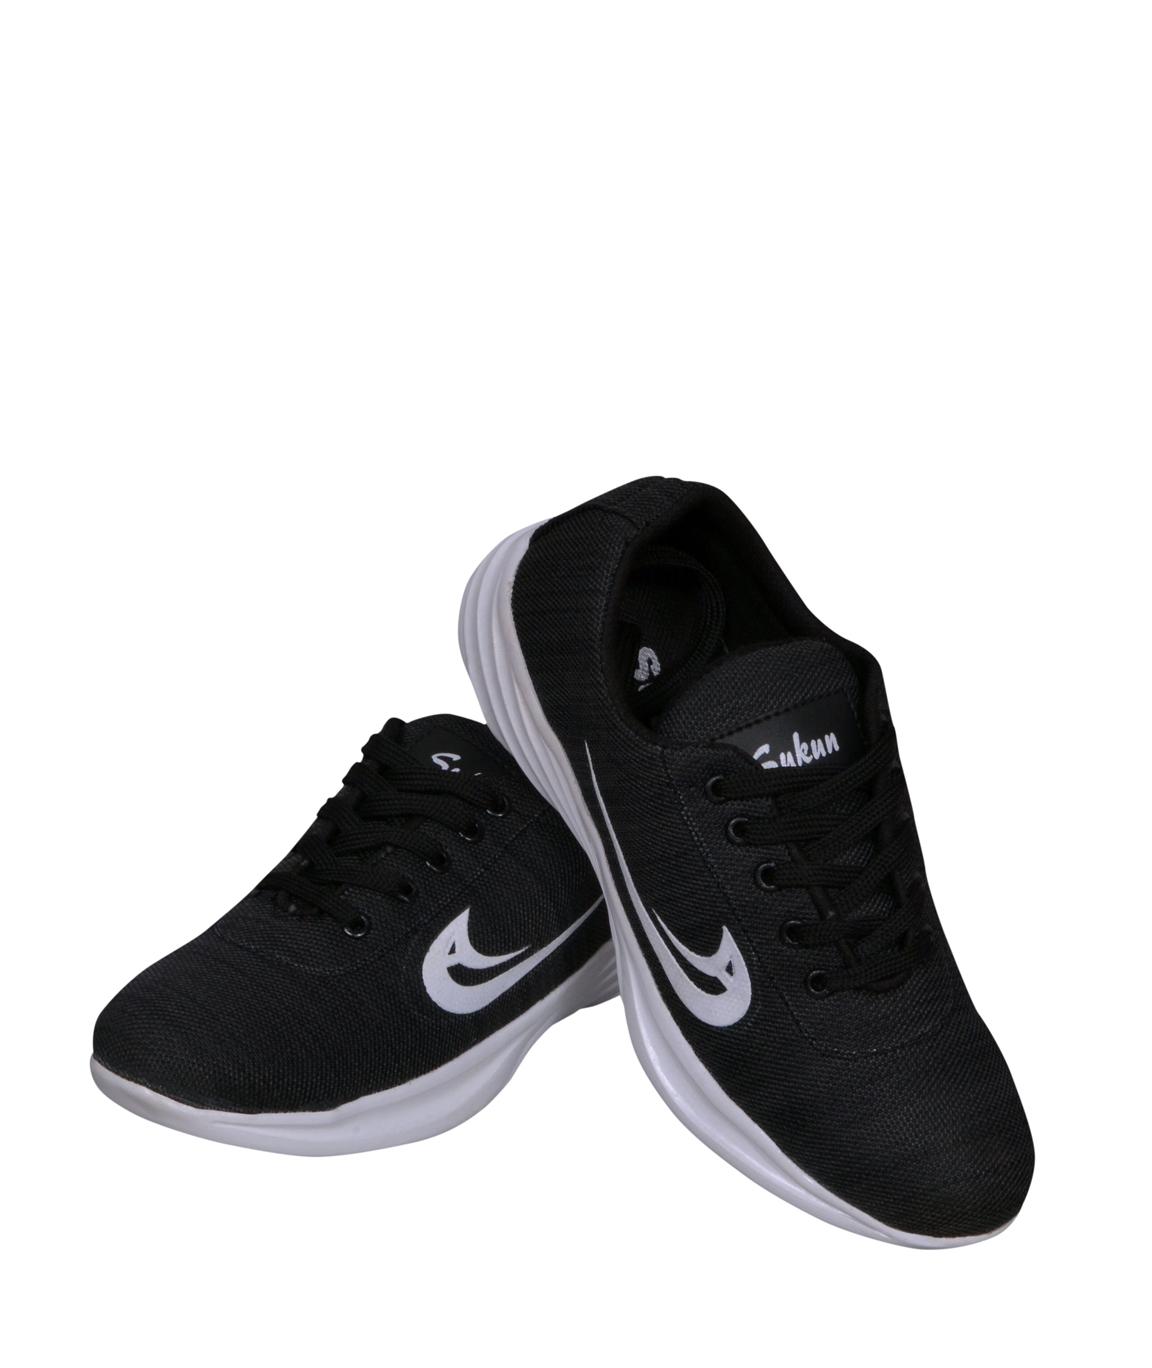 SukunSports Sneaker Shoes-BLACK